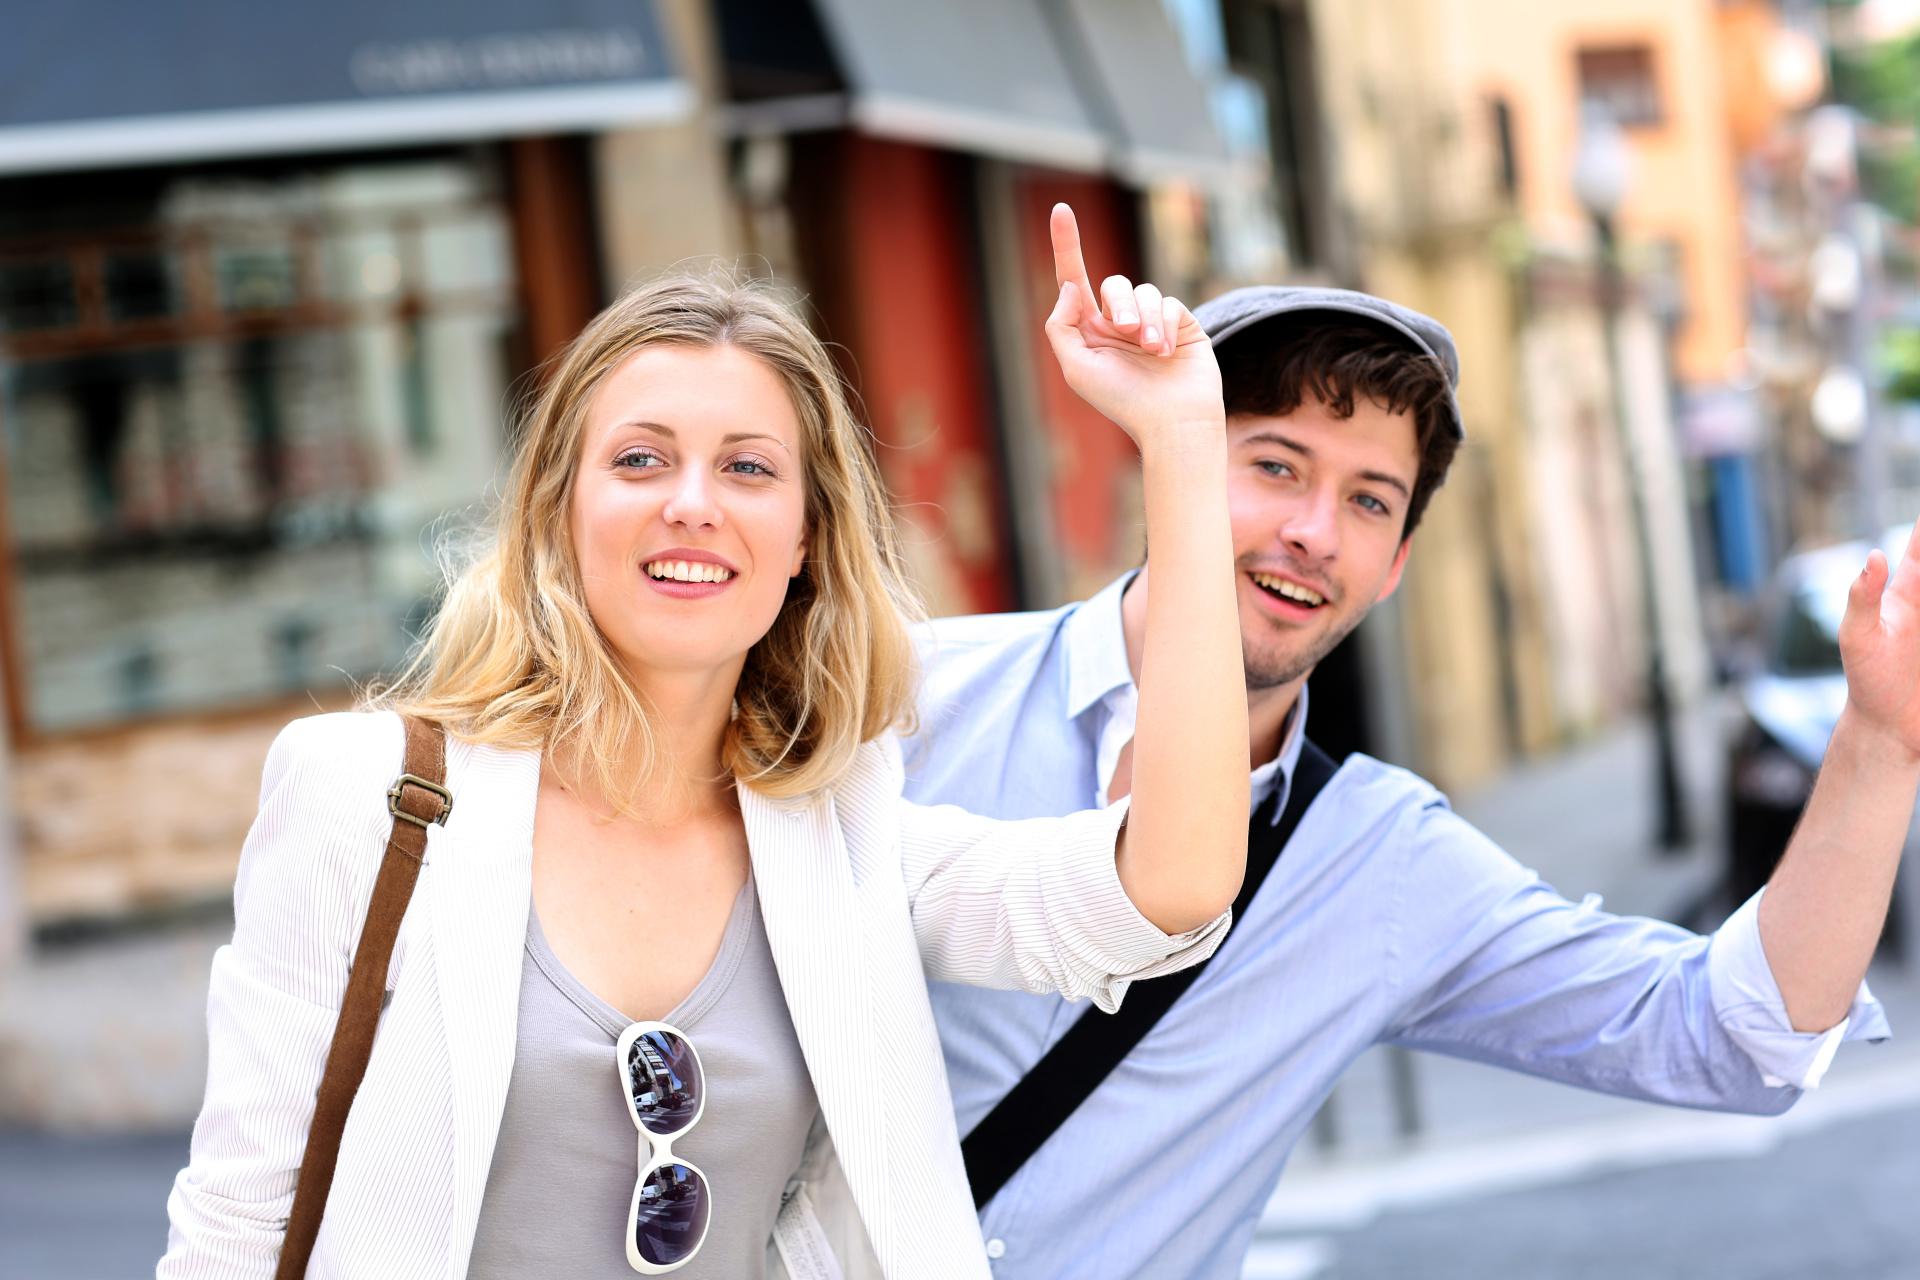 couple hailing a taxi, taxi service